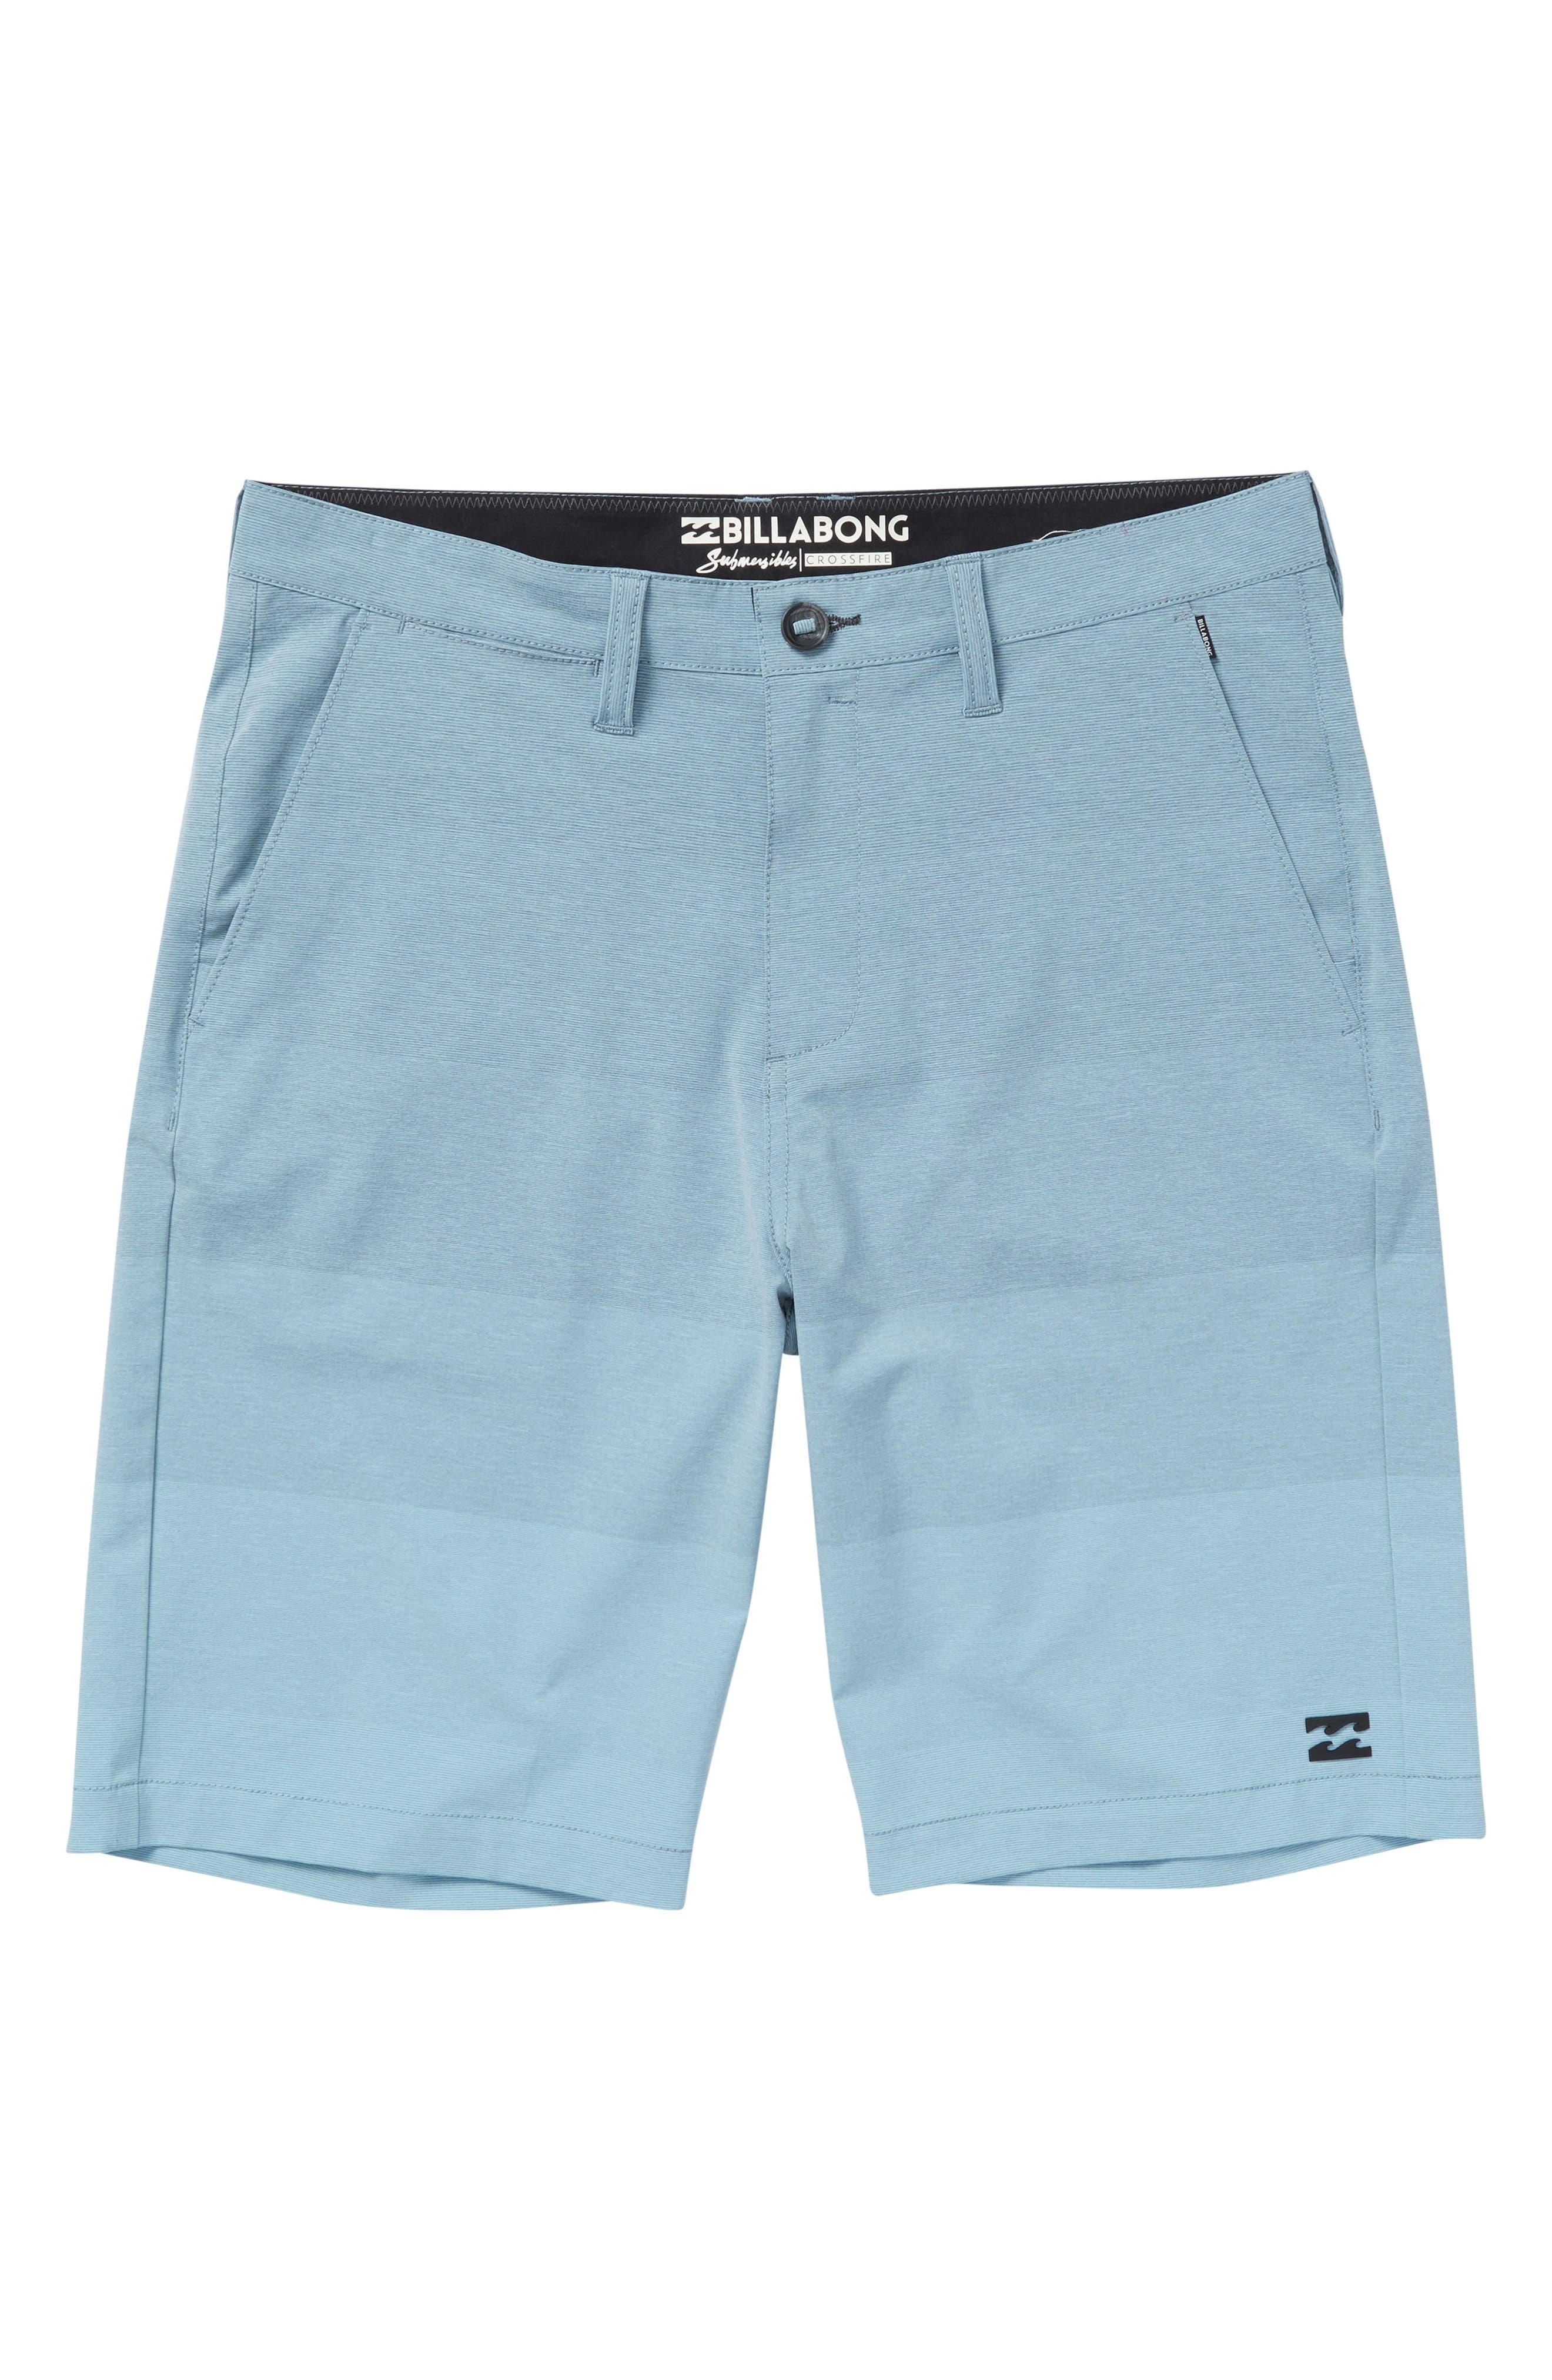 Crossfire X Faderade Hybrid Shorts,                         Main,                         color, Blue